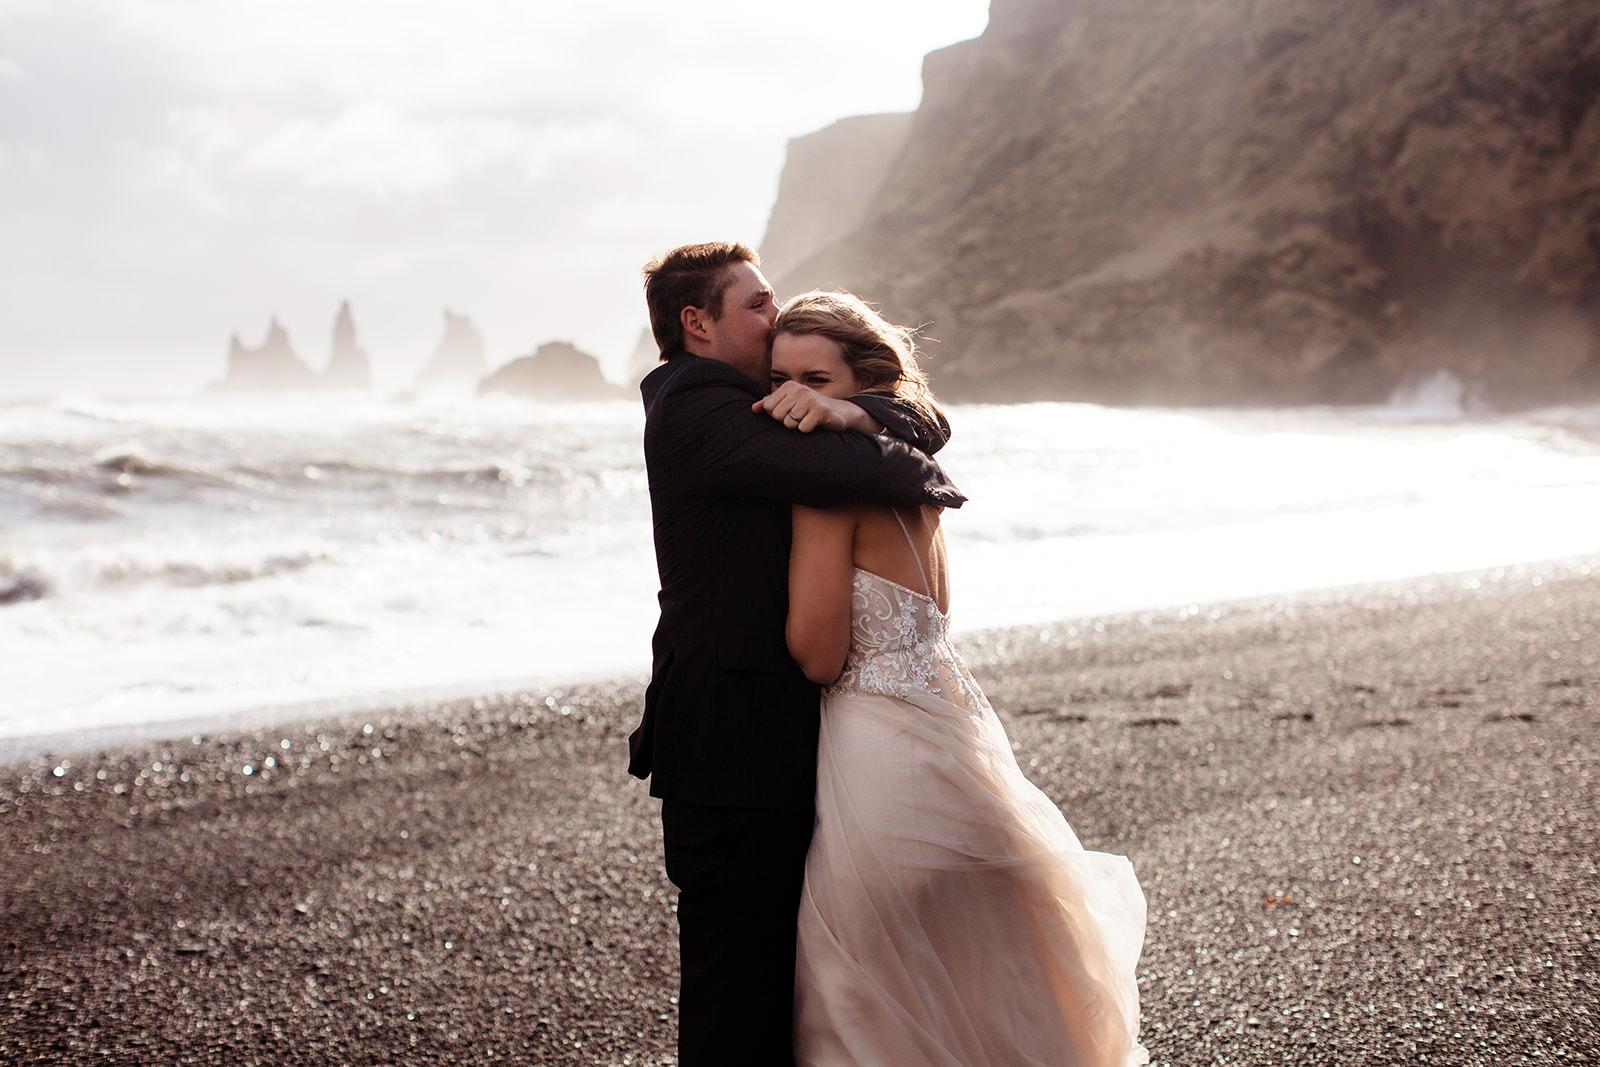 Icelandic Iceland Elopement Wedding Elope Photographer Eloping Reykjavík Vik Black Sand Beach Jökulsárlón Skogafoss Waterfall Vestrahorn Mountain Liz Osban Photography Destination 74.jpg